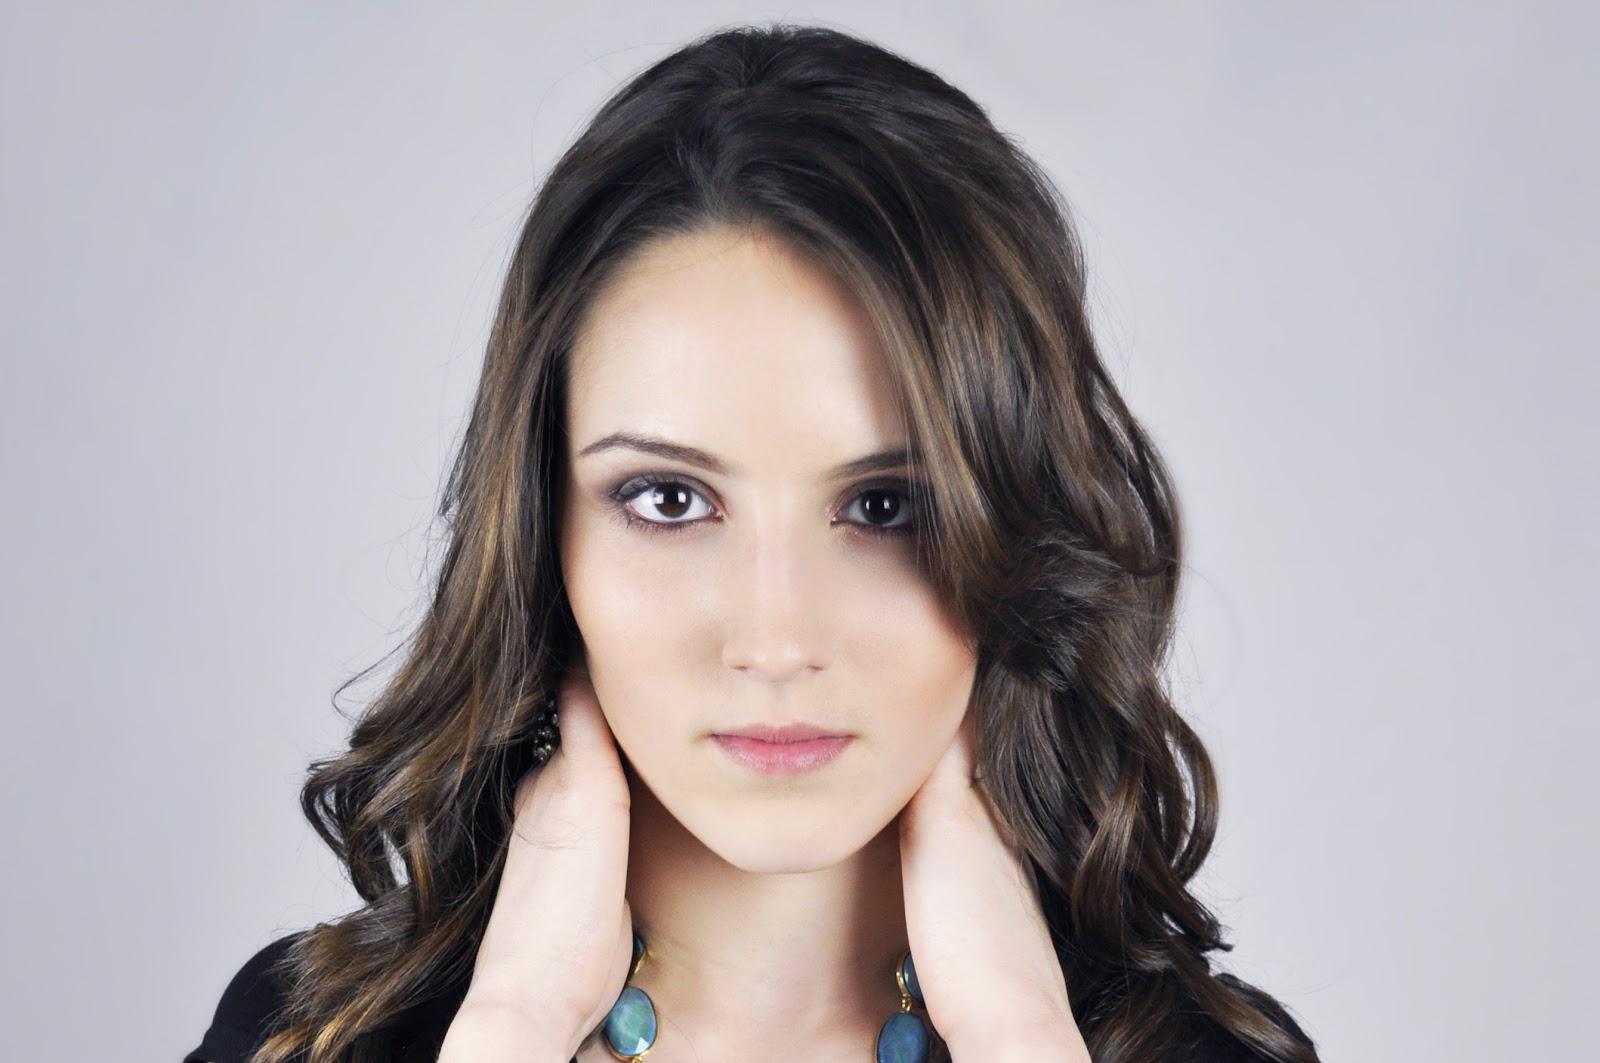 https://static.pexels.com/photos/51969/model-female-girl-beautiful-51969.jpeg